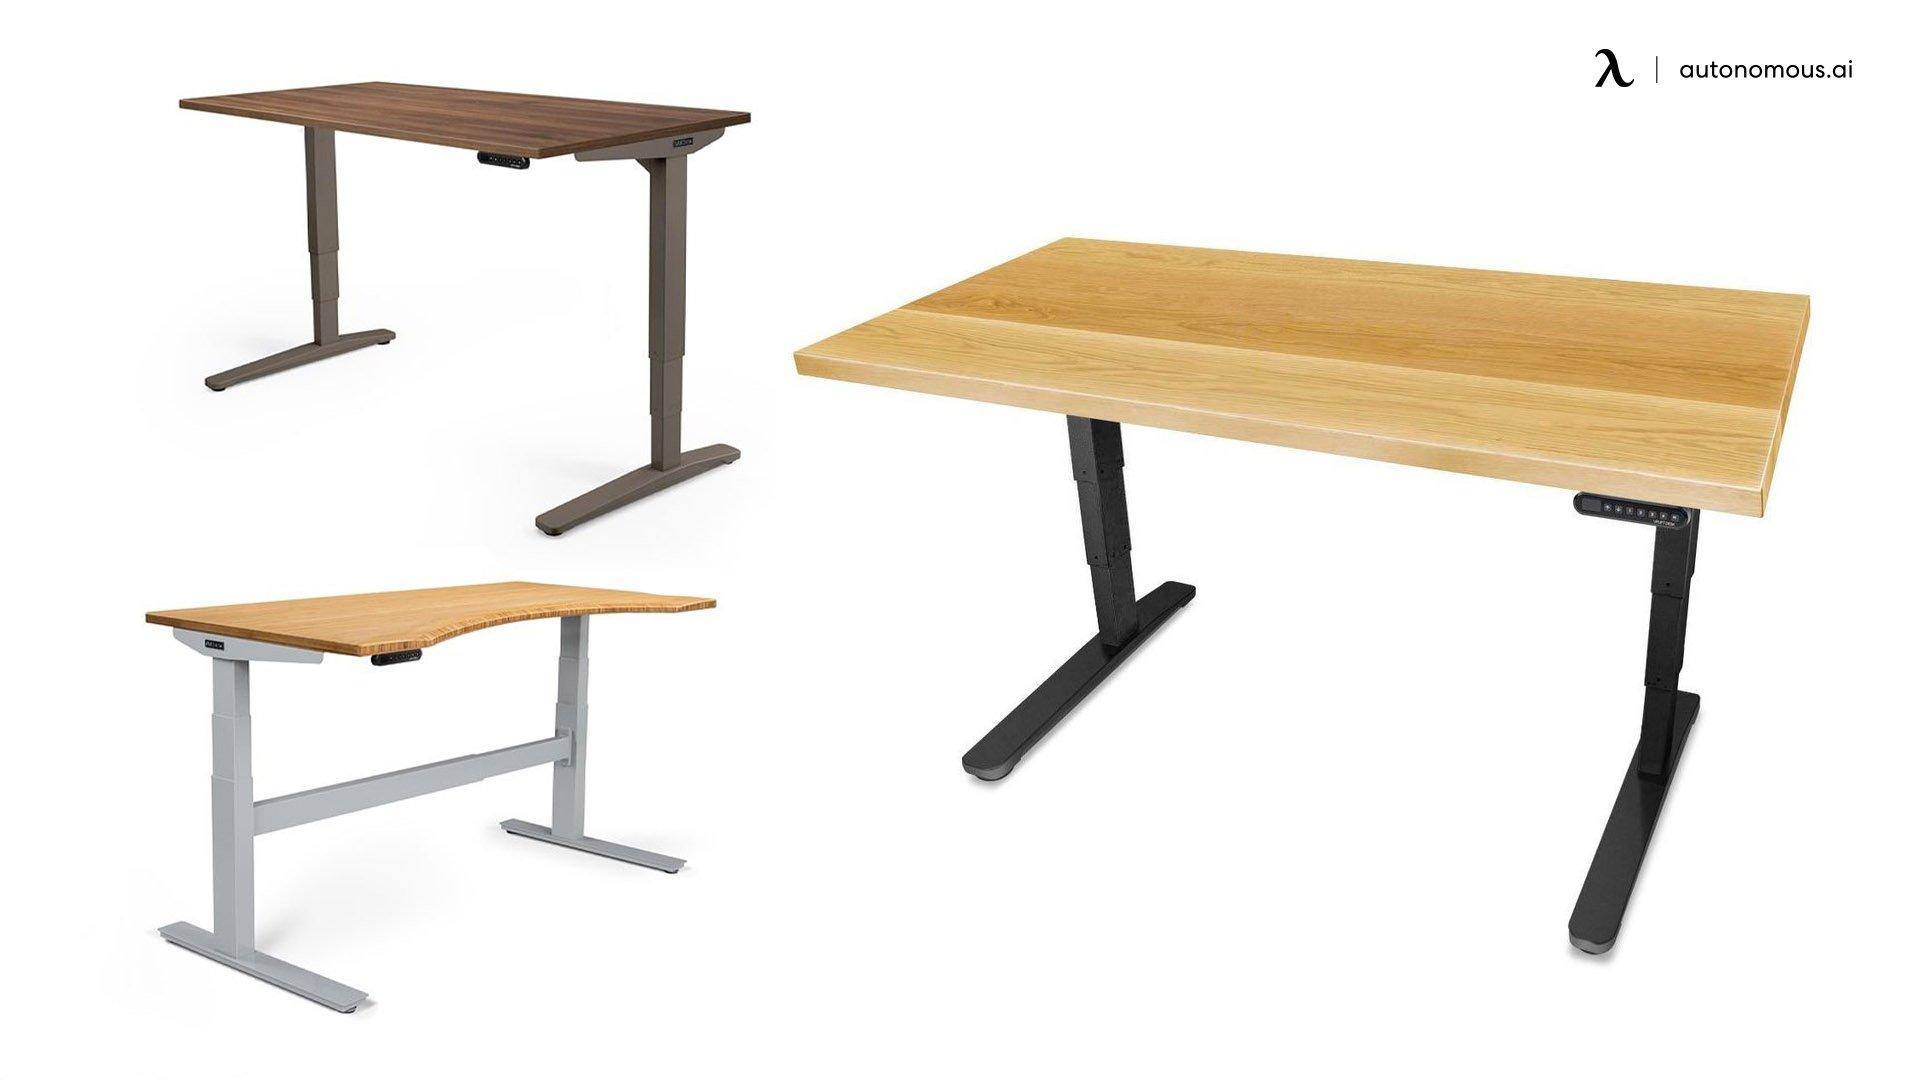 Uplift Standing Desk for Home Use